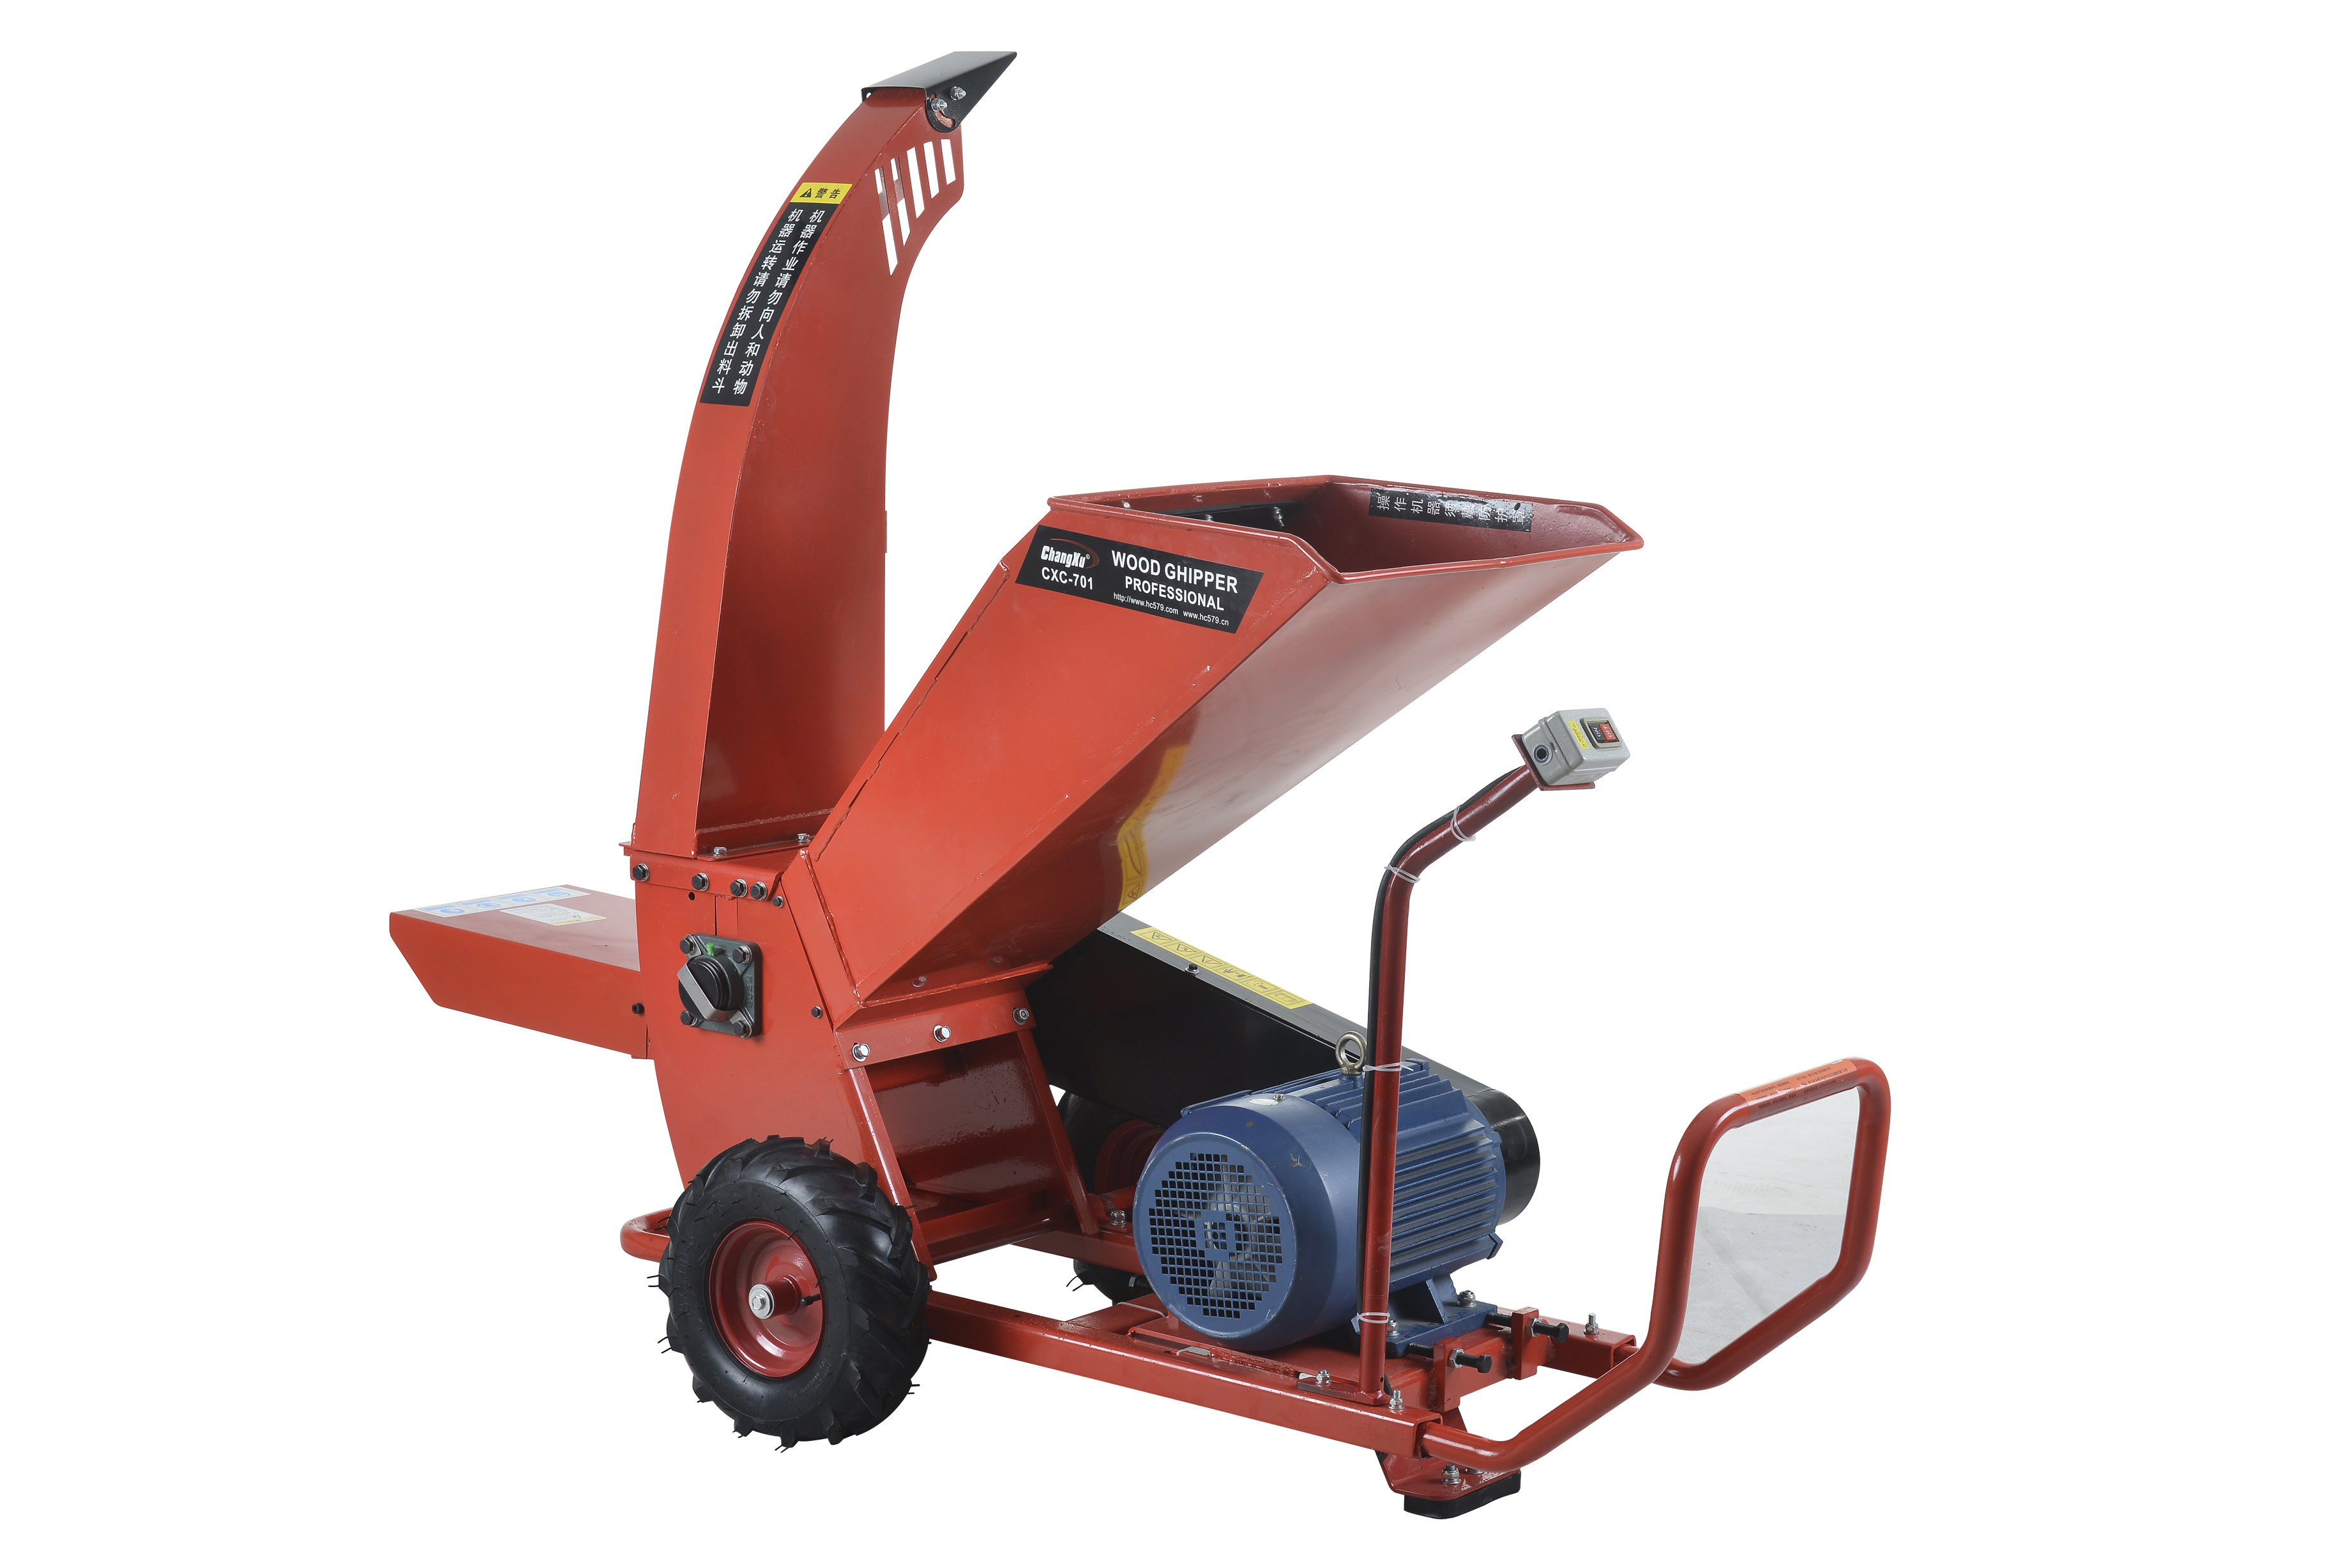 Wood Chipper Machine, CXC-703D Branch Shredder, Garden Shredders With Motor